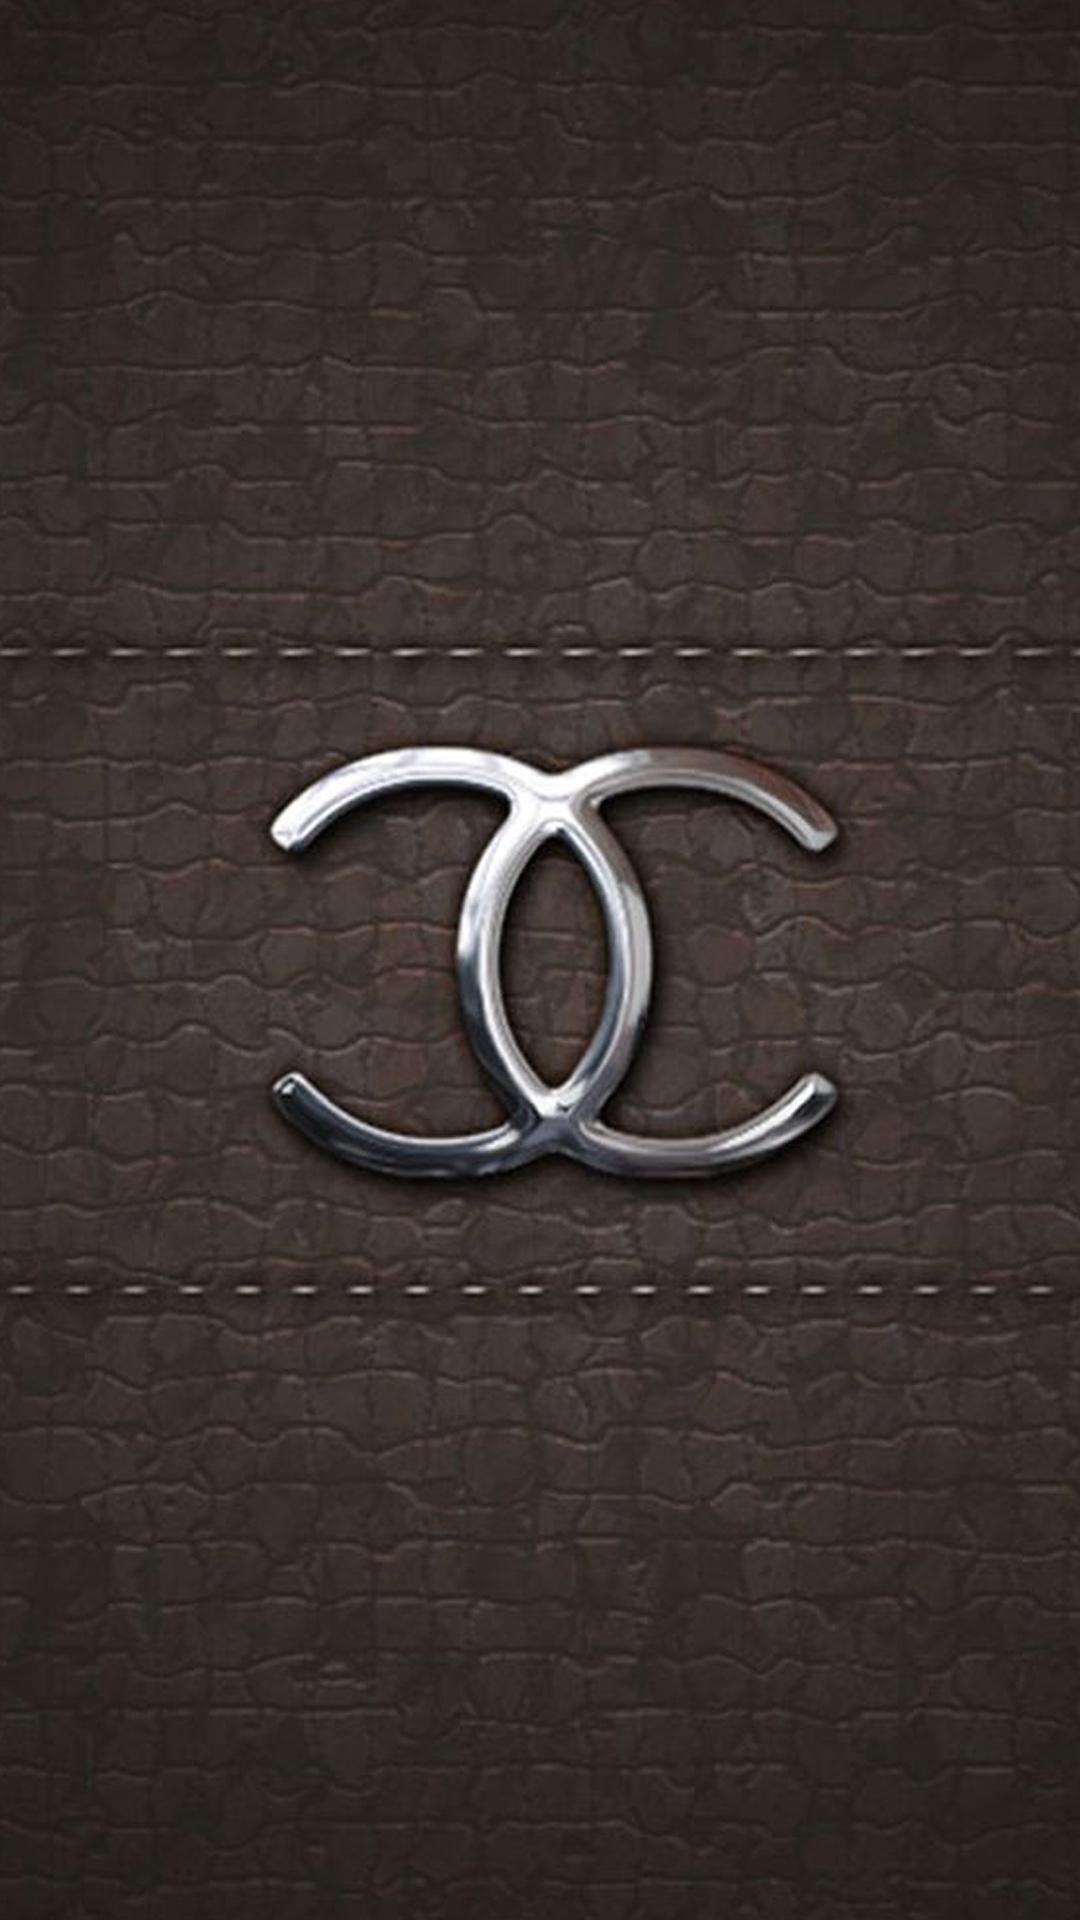 Gucci Wallpaper Iphone 7 Chanel Iphone Wallpapers Hd Pixelstalk Net